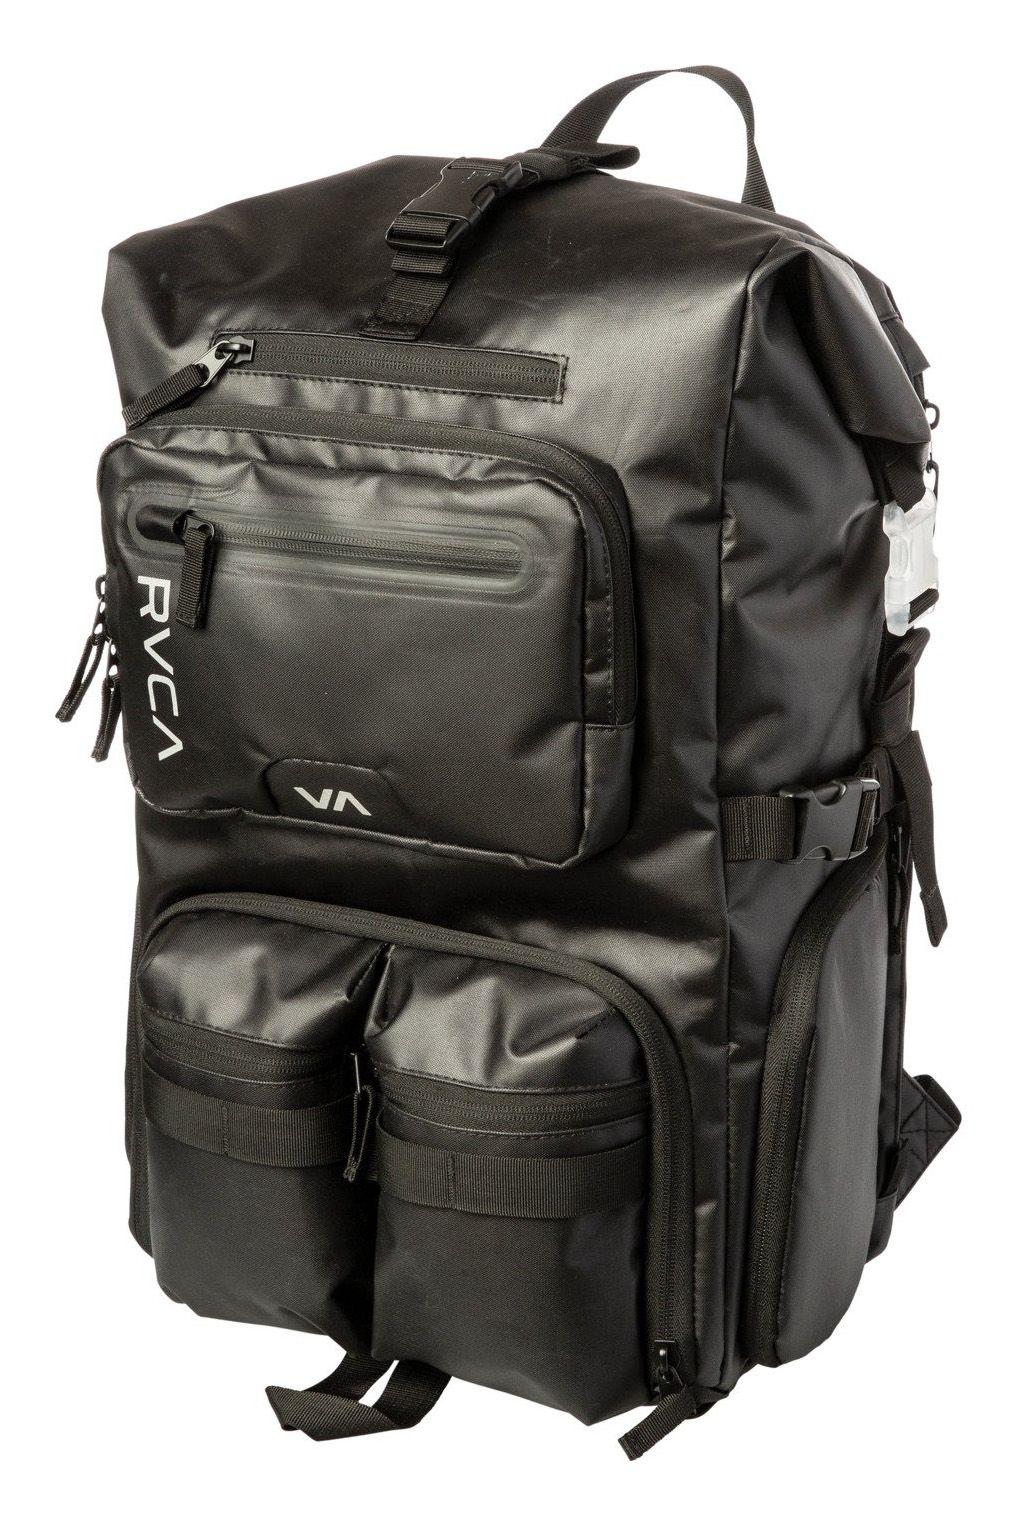 RVCA Backpack ZAK NOYLE BACKPACK ZAK NOYLE Black